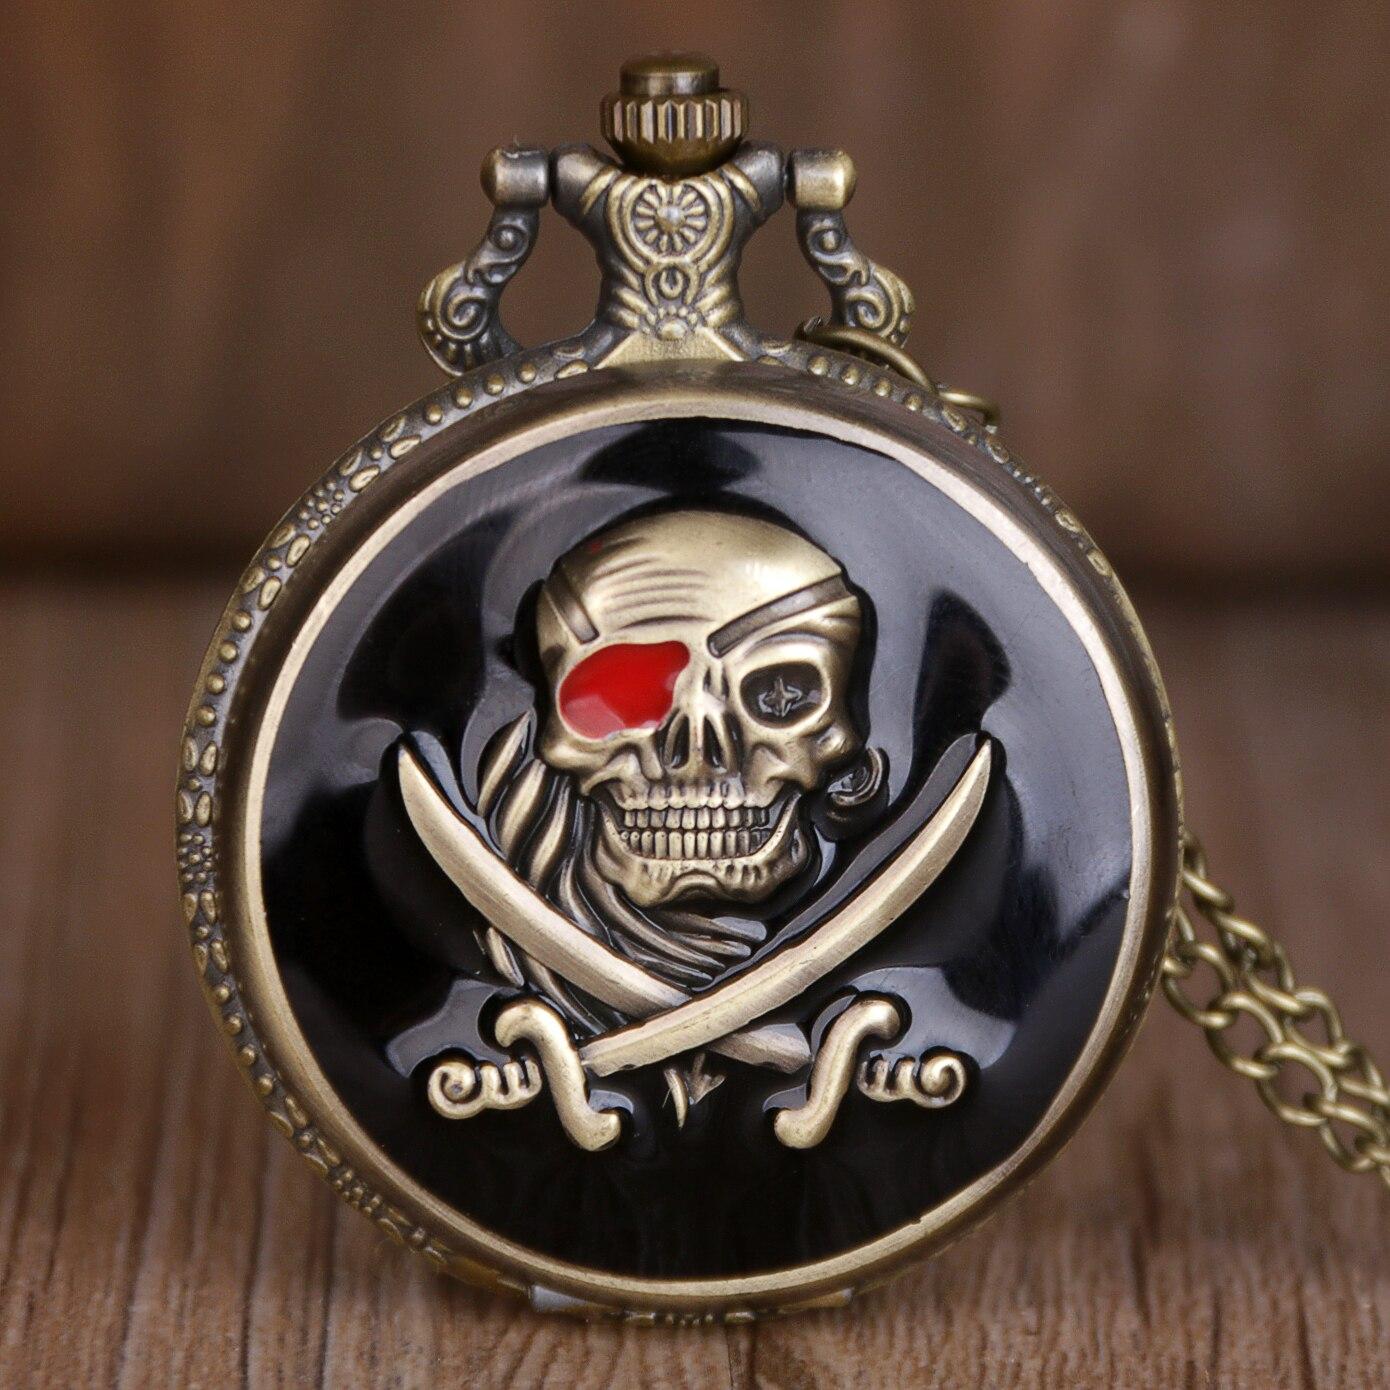 New Bronze Skull Pocket Watch Necklace Chain Vintage Quartz Pocket Fob Watches White Dial Men Women TD2004